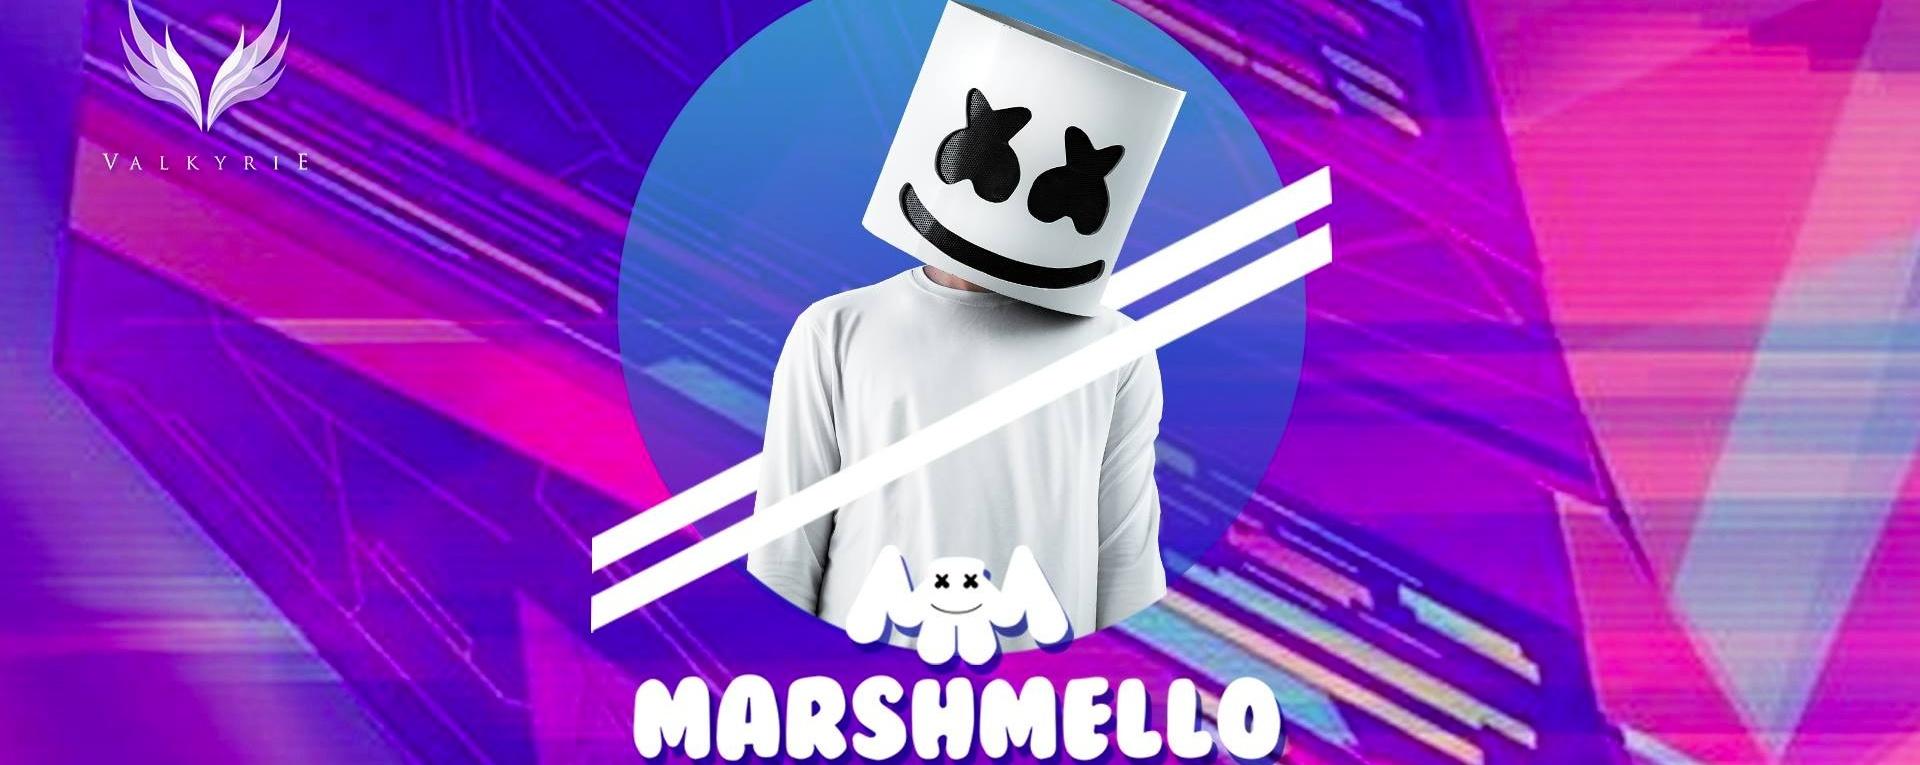 Marshmello Live at Valkyrie Nightclub